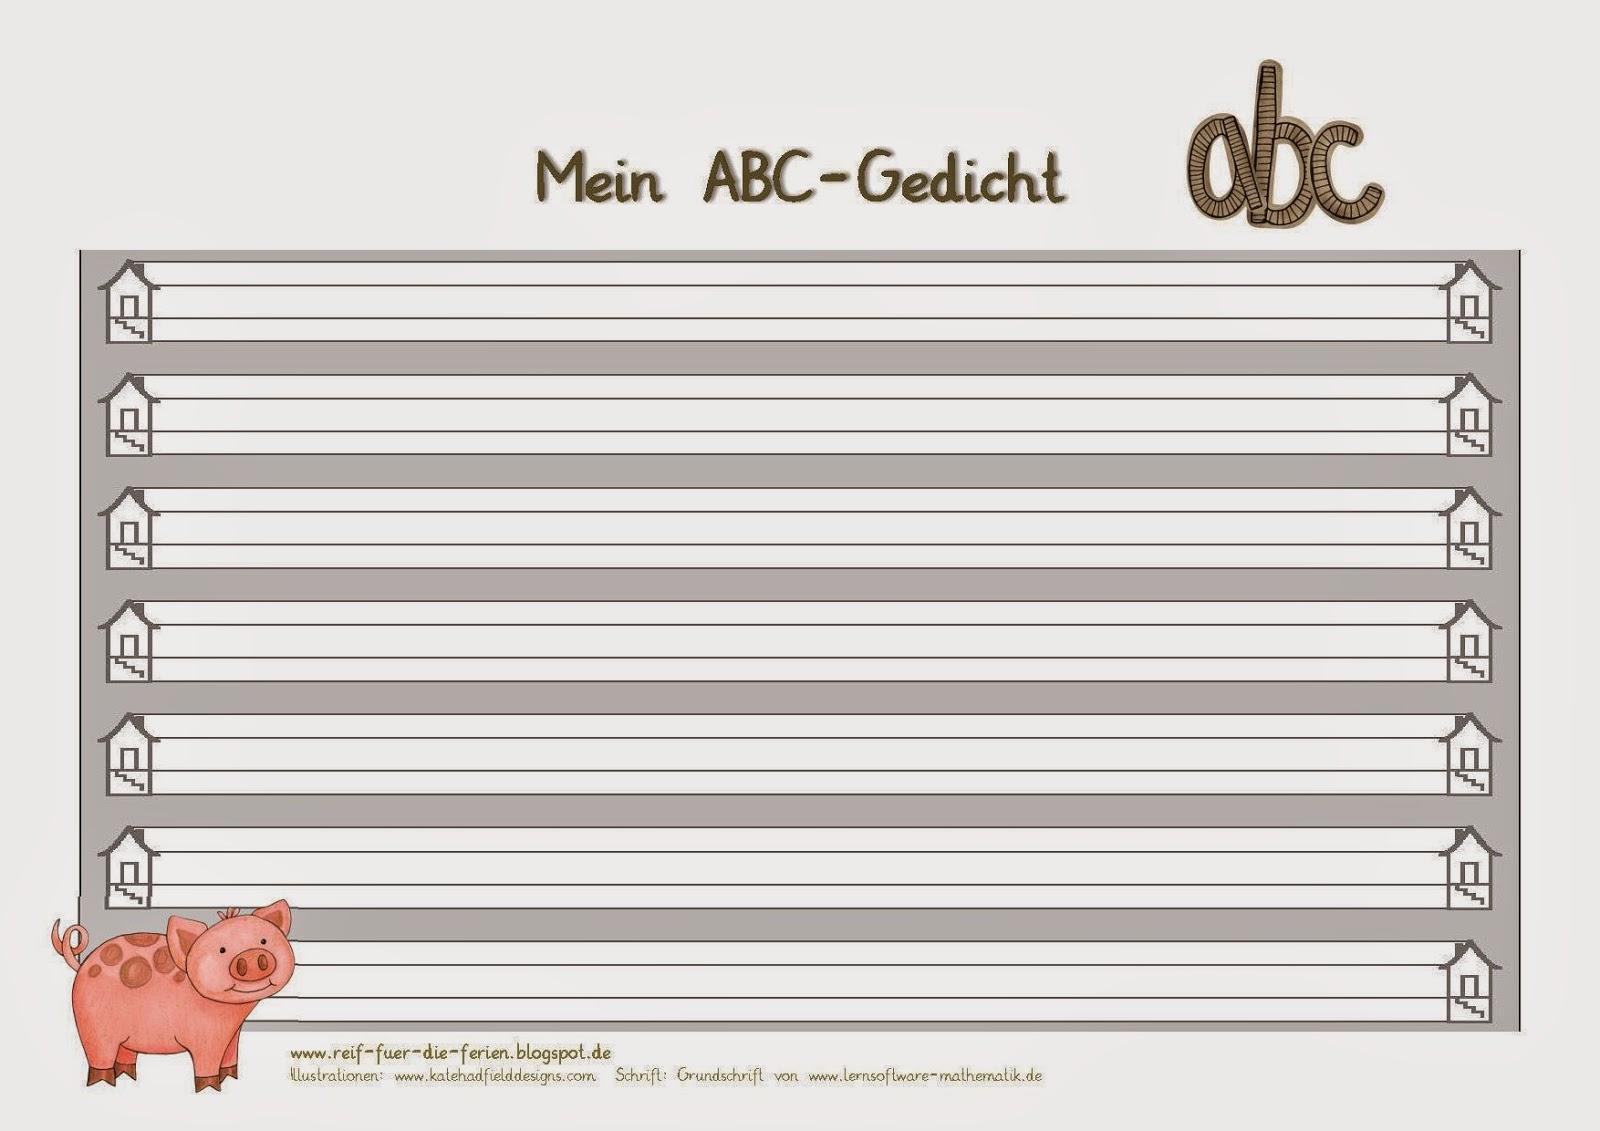 ABC-Gedichtblatt quer